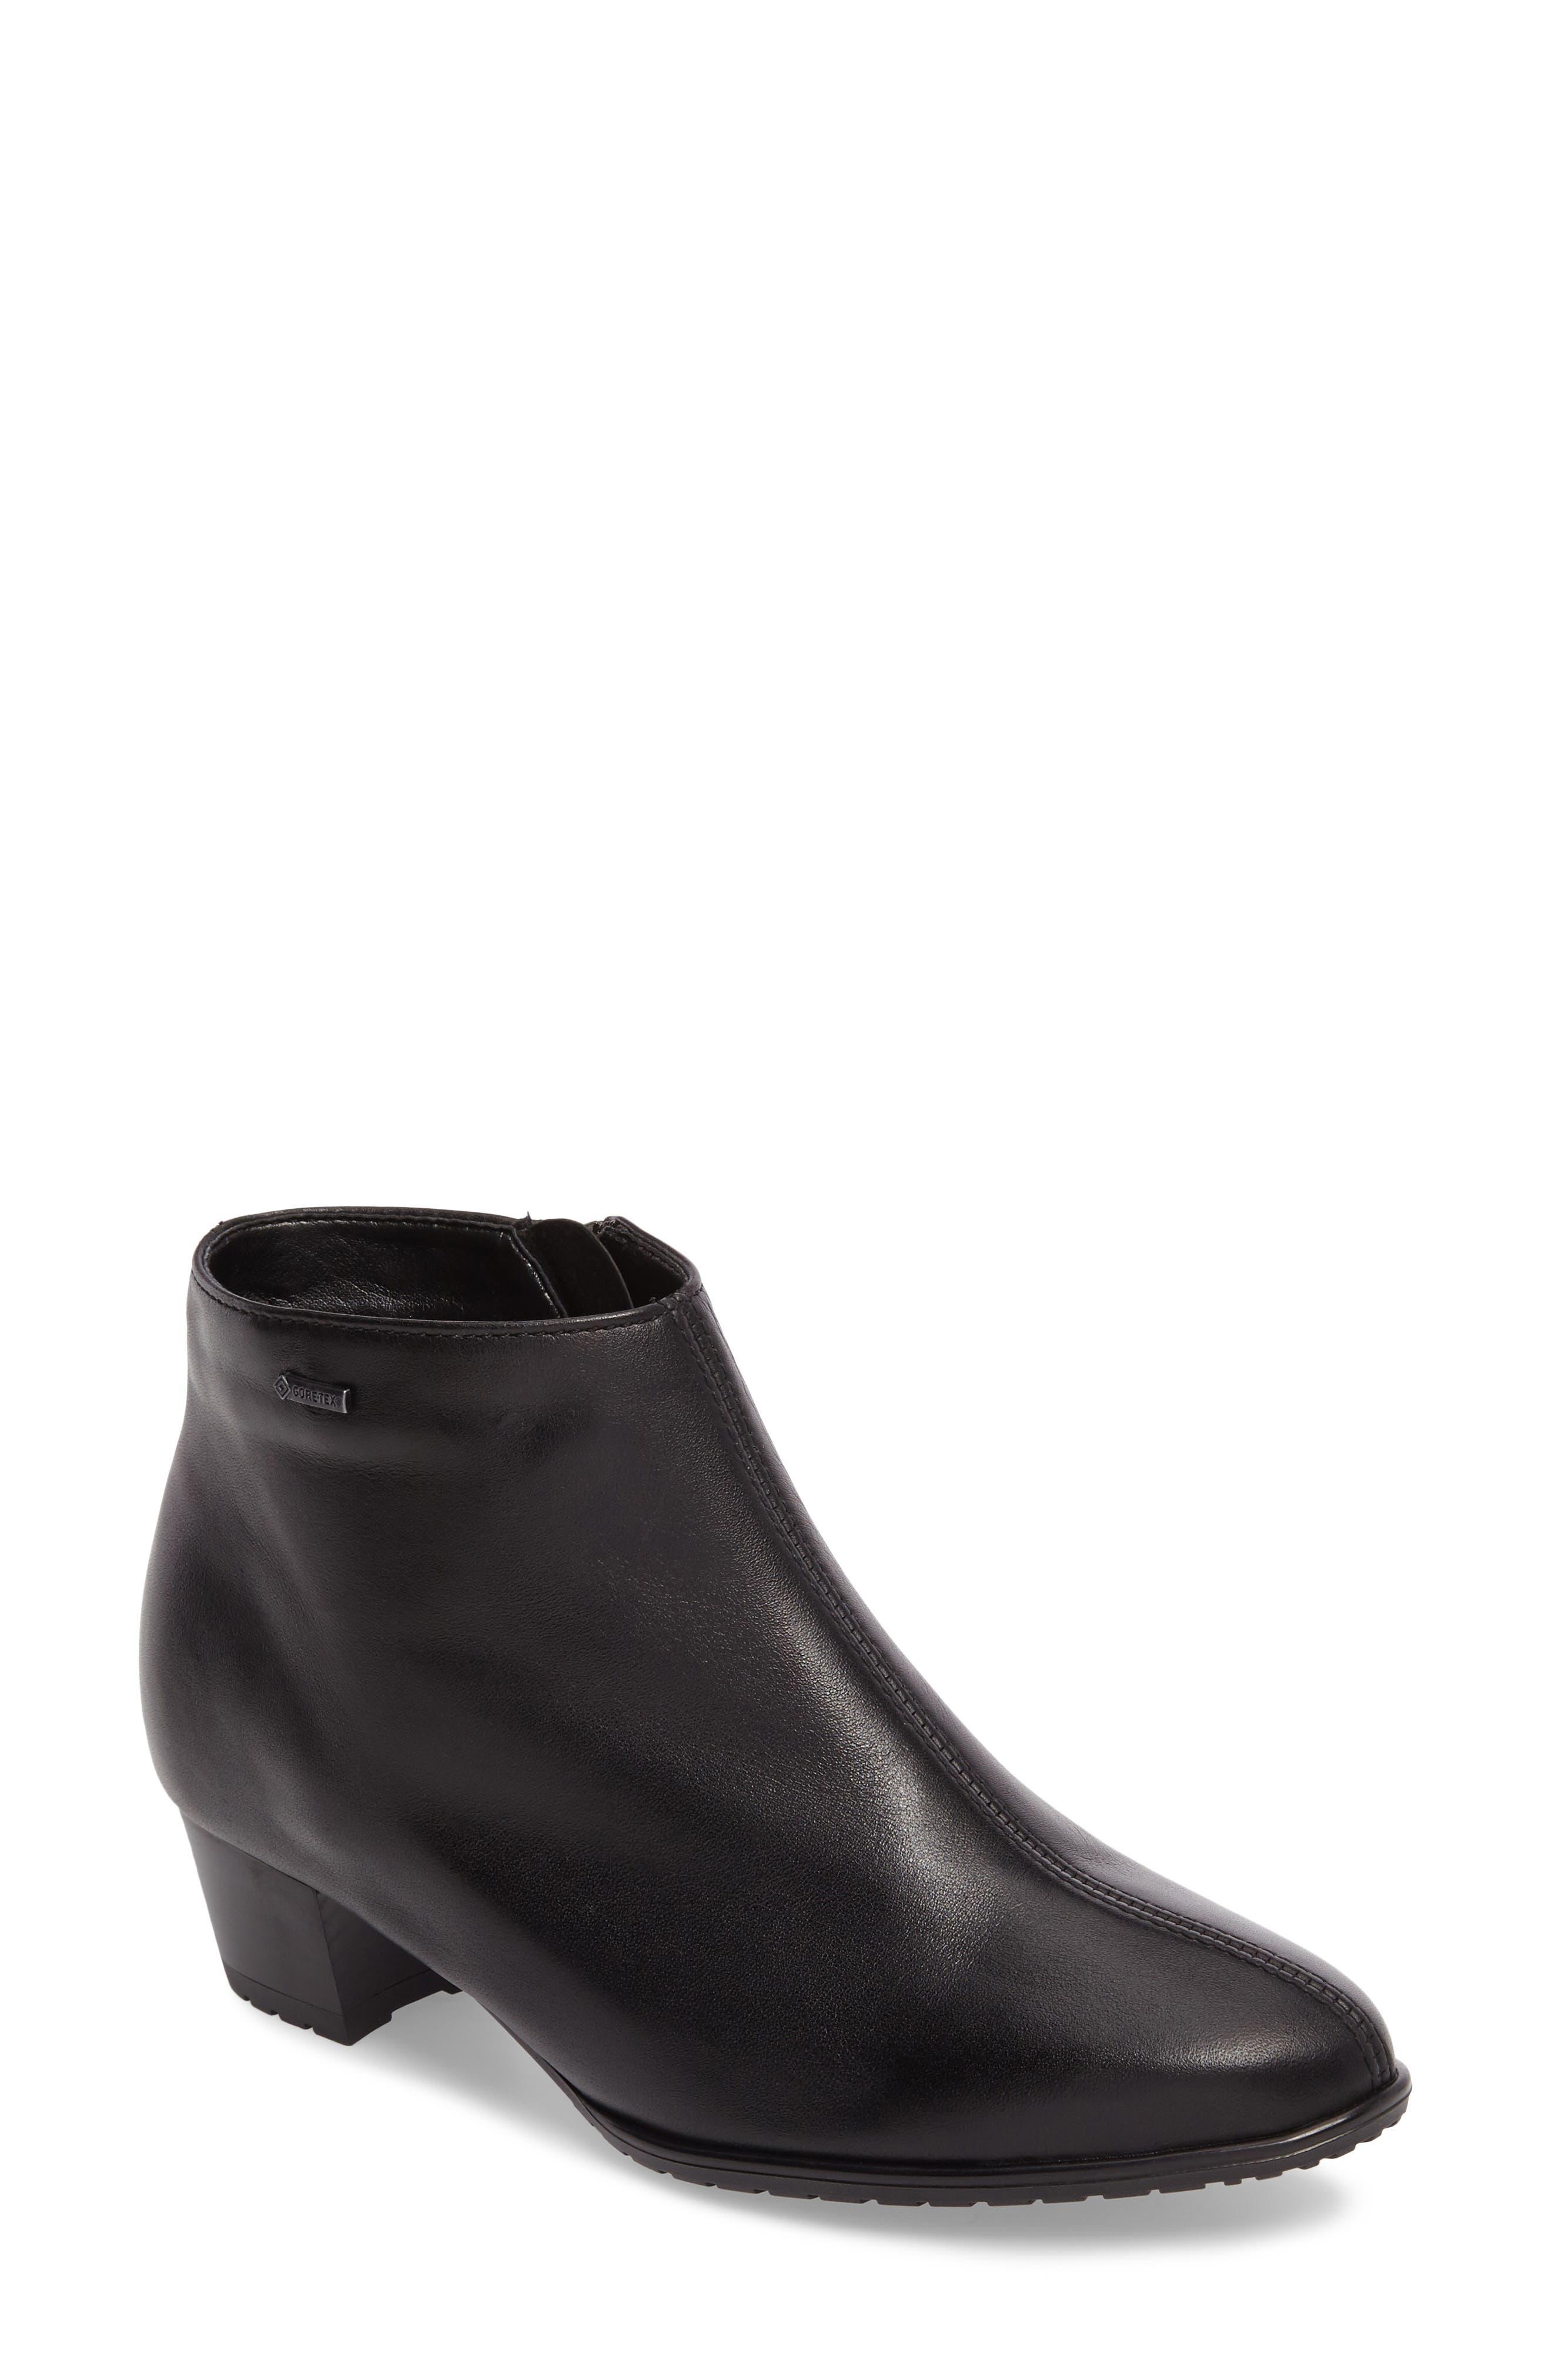 Prisha Waterproof Gore-Tex<sup>®</sup> Bootie,                         Main,                         color, Black Leather